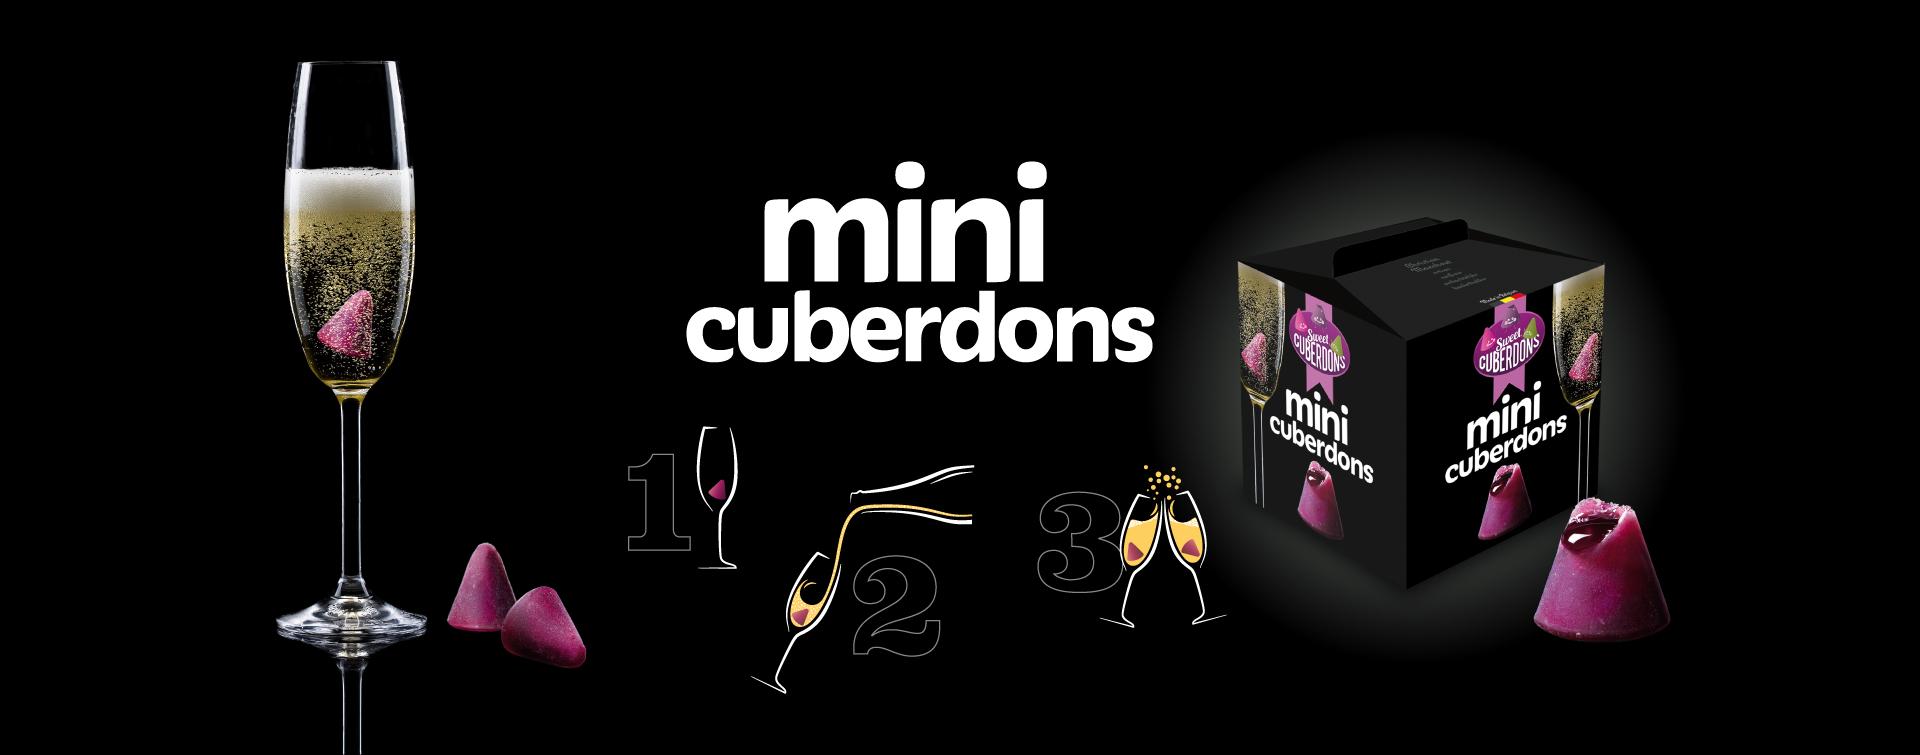 MINI_CUBERDONS_banner